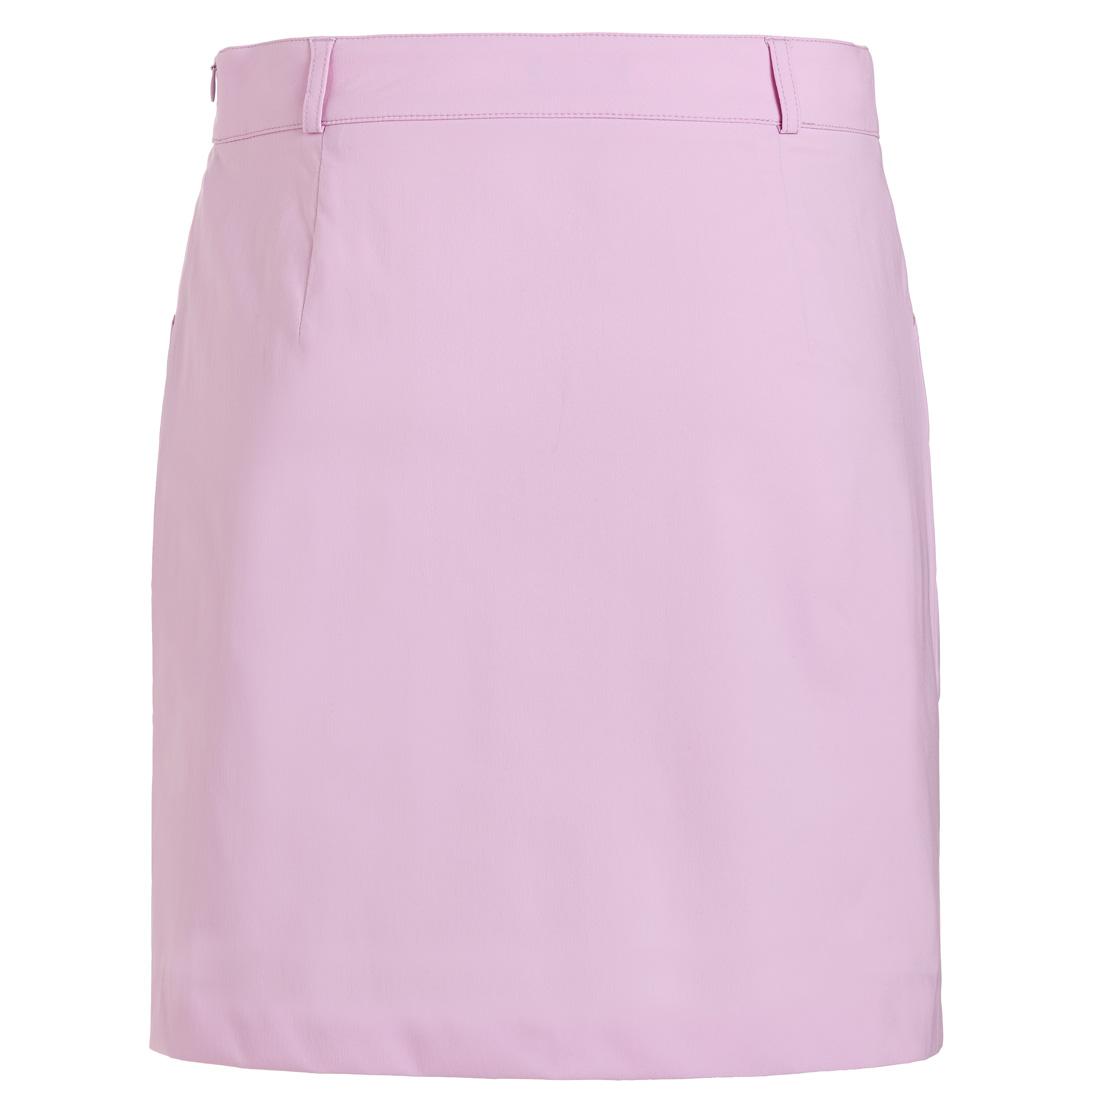 Damen Funktions-Golfrock mit UV-Schutz in Comfortable Fit